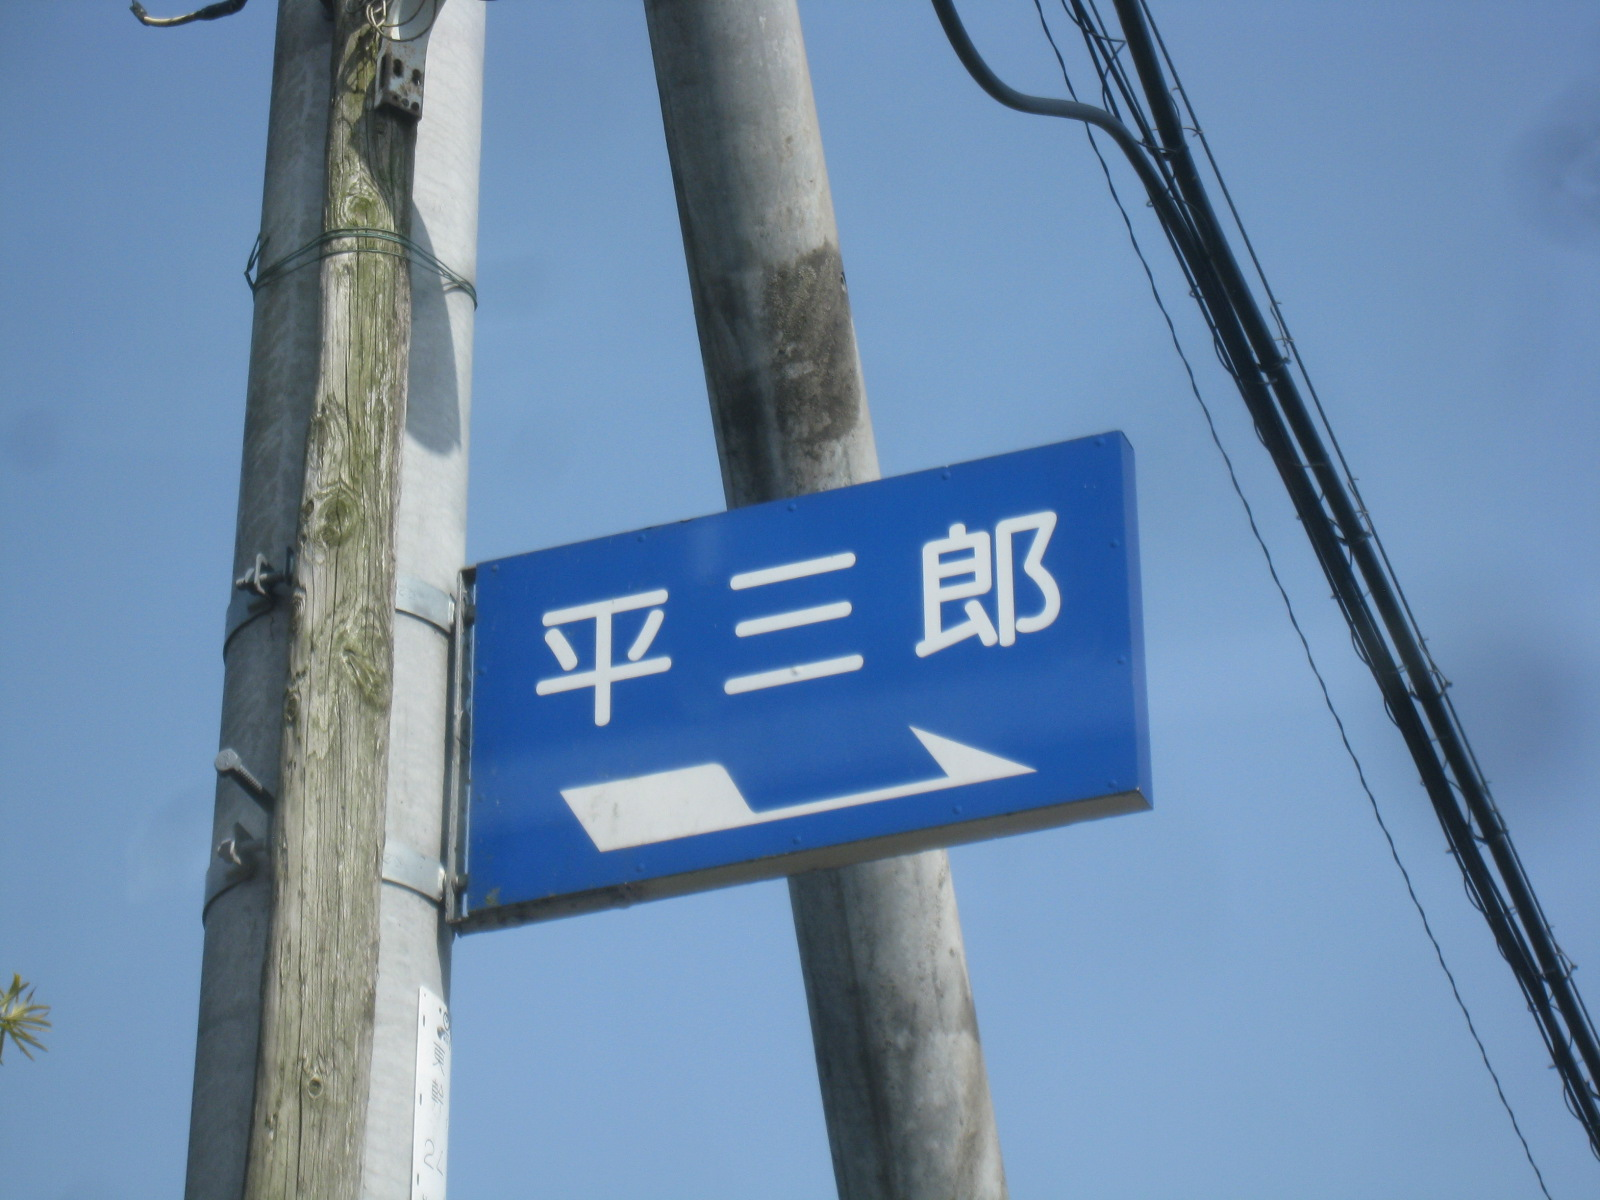 茨城県竜ケ崎市の「平三郎」。